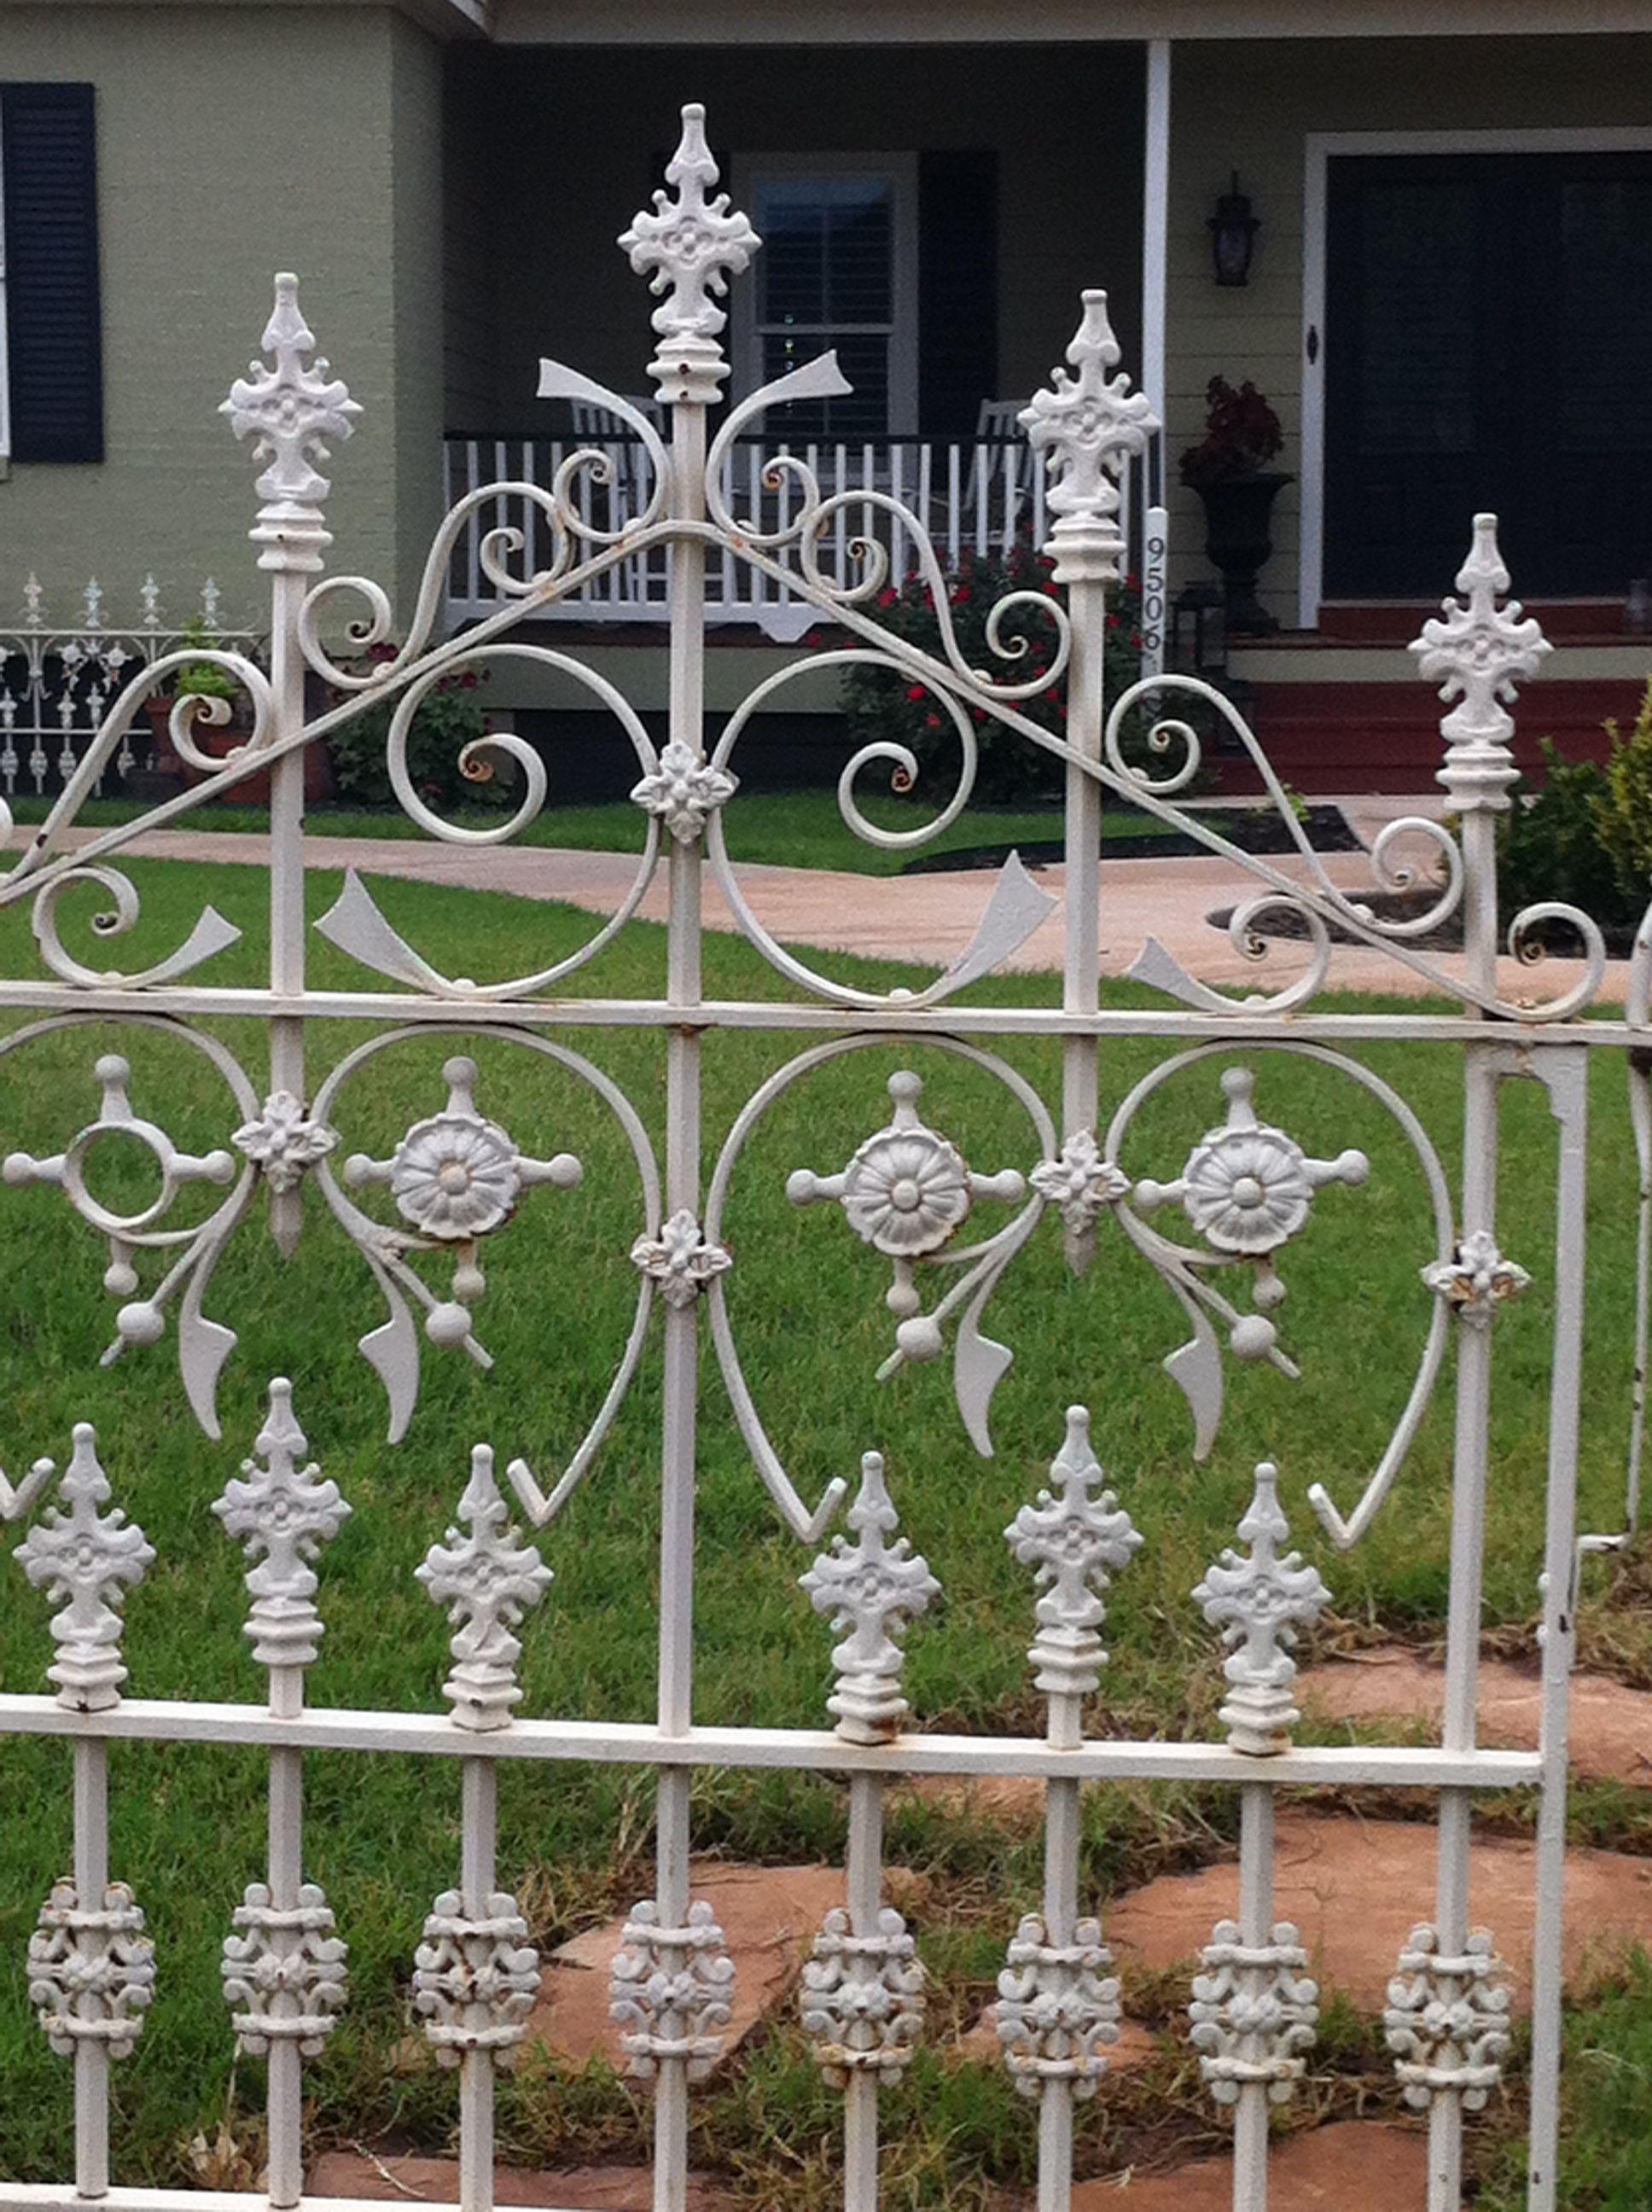 Old Iron Fence I Found On Craigslist Jackpot Pallet Fence